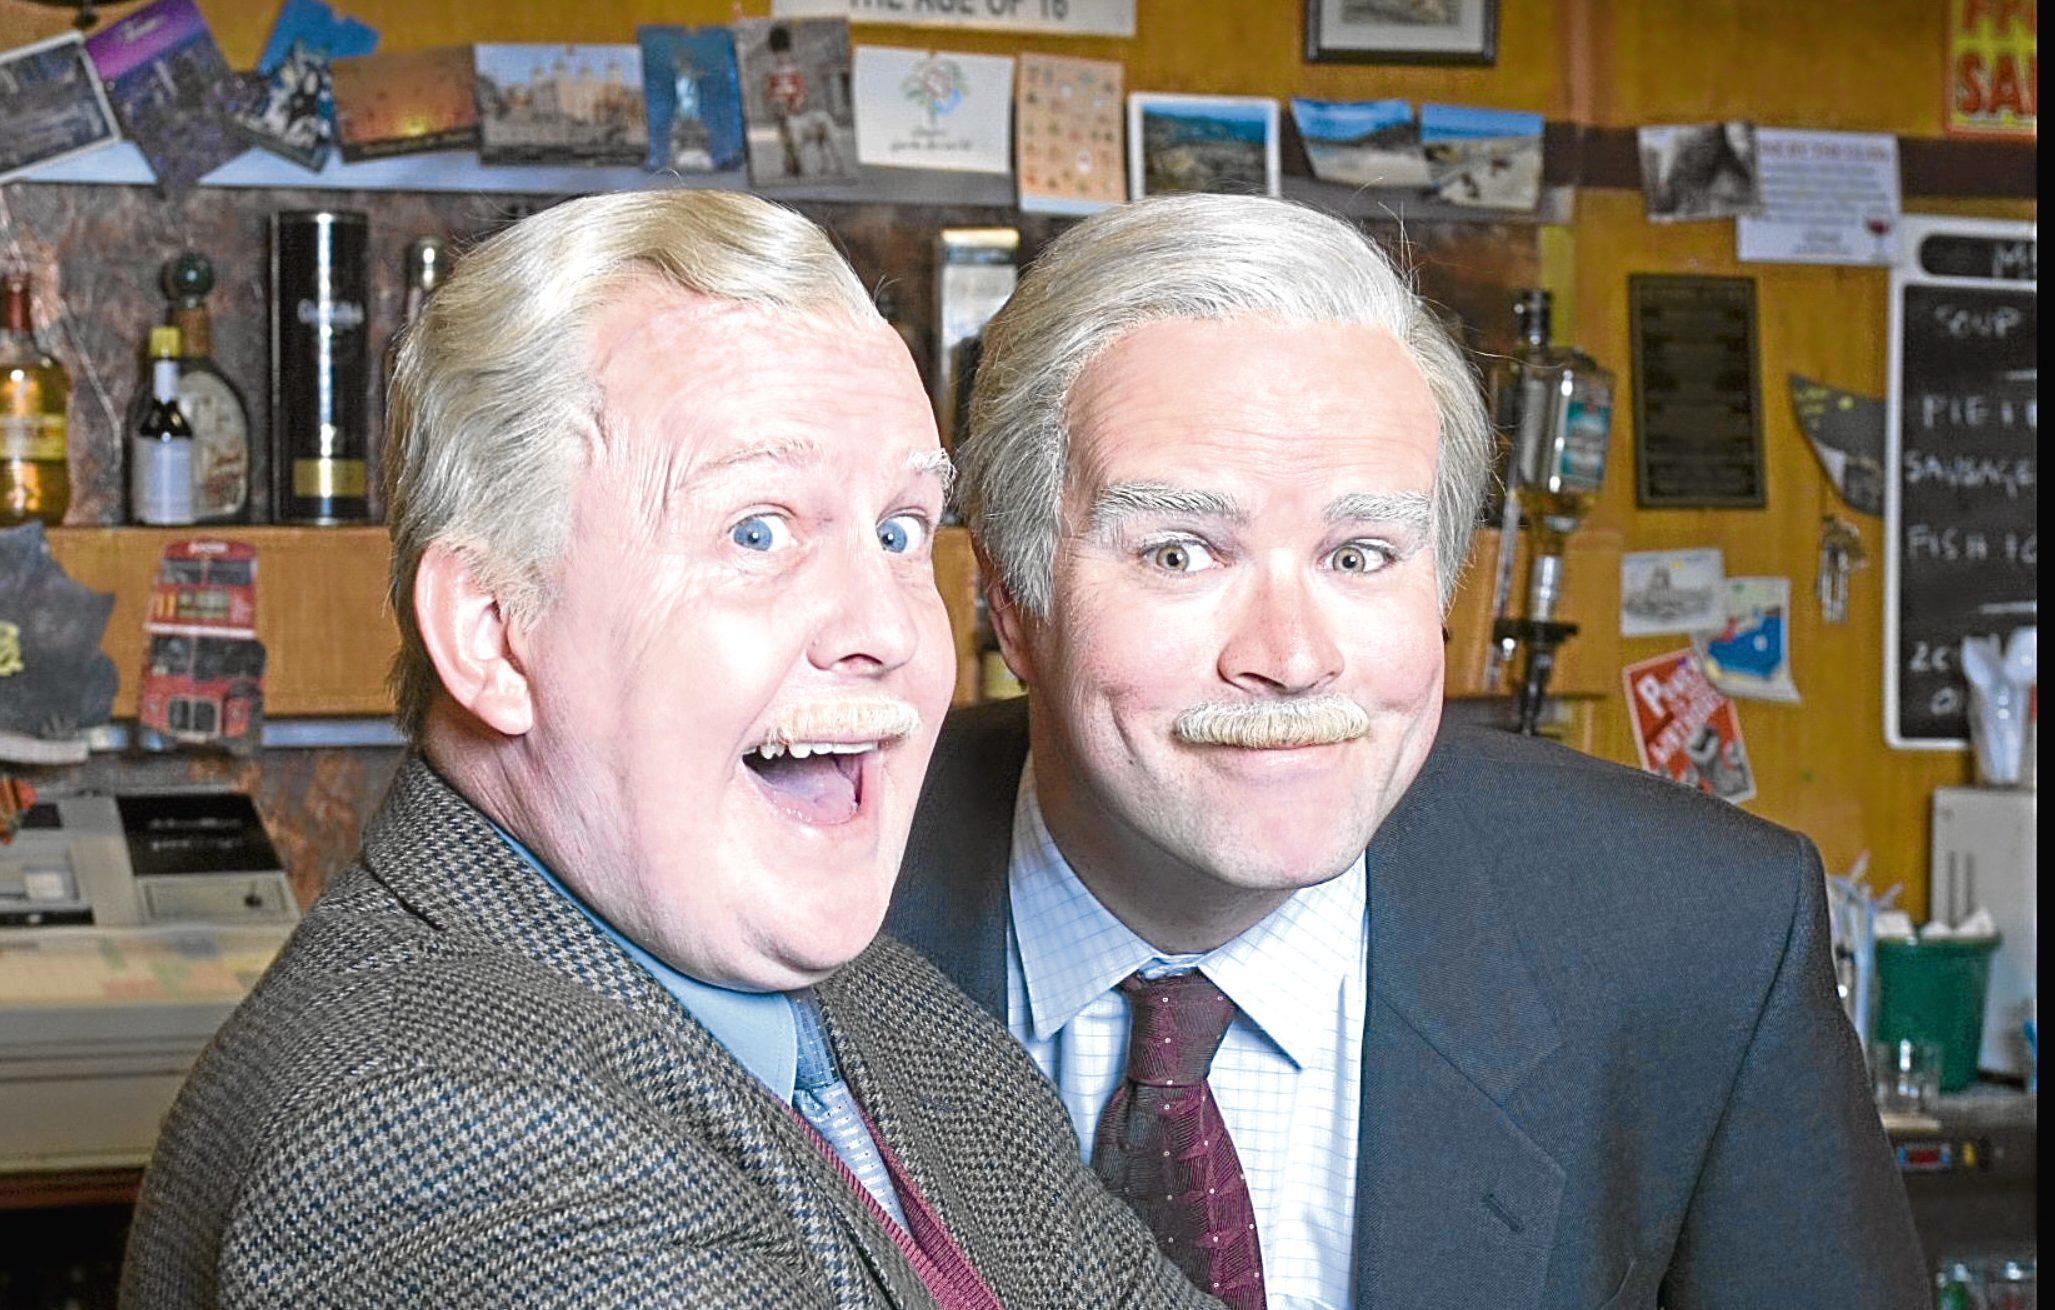 Ford Kiernan and Greg Hemphill (BBC)